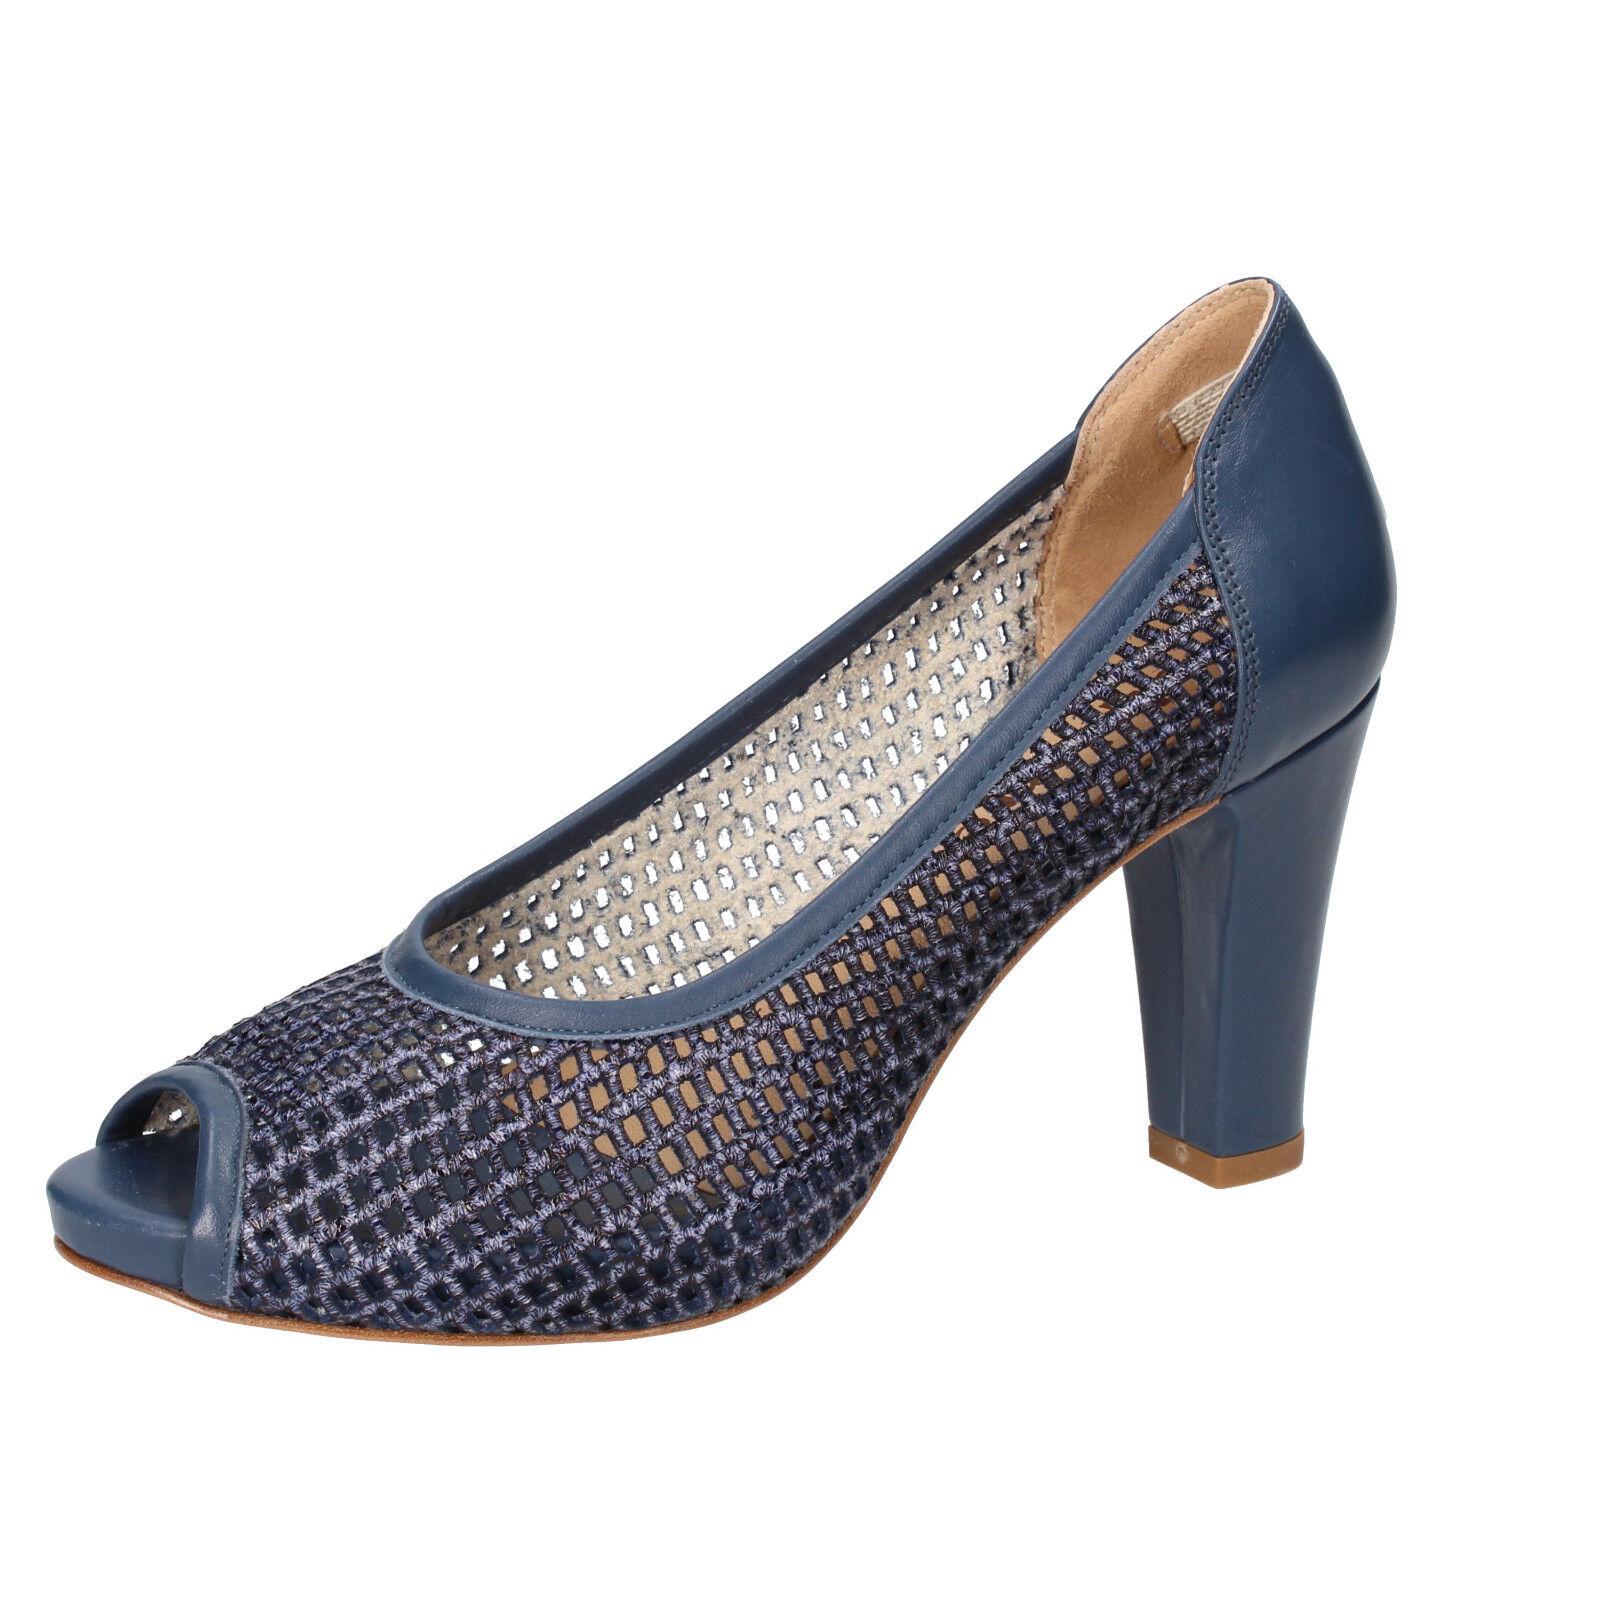 mujer zapatos Calpierre 35 Pumps azul Leather bz803-b